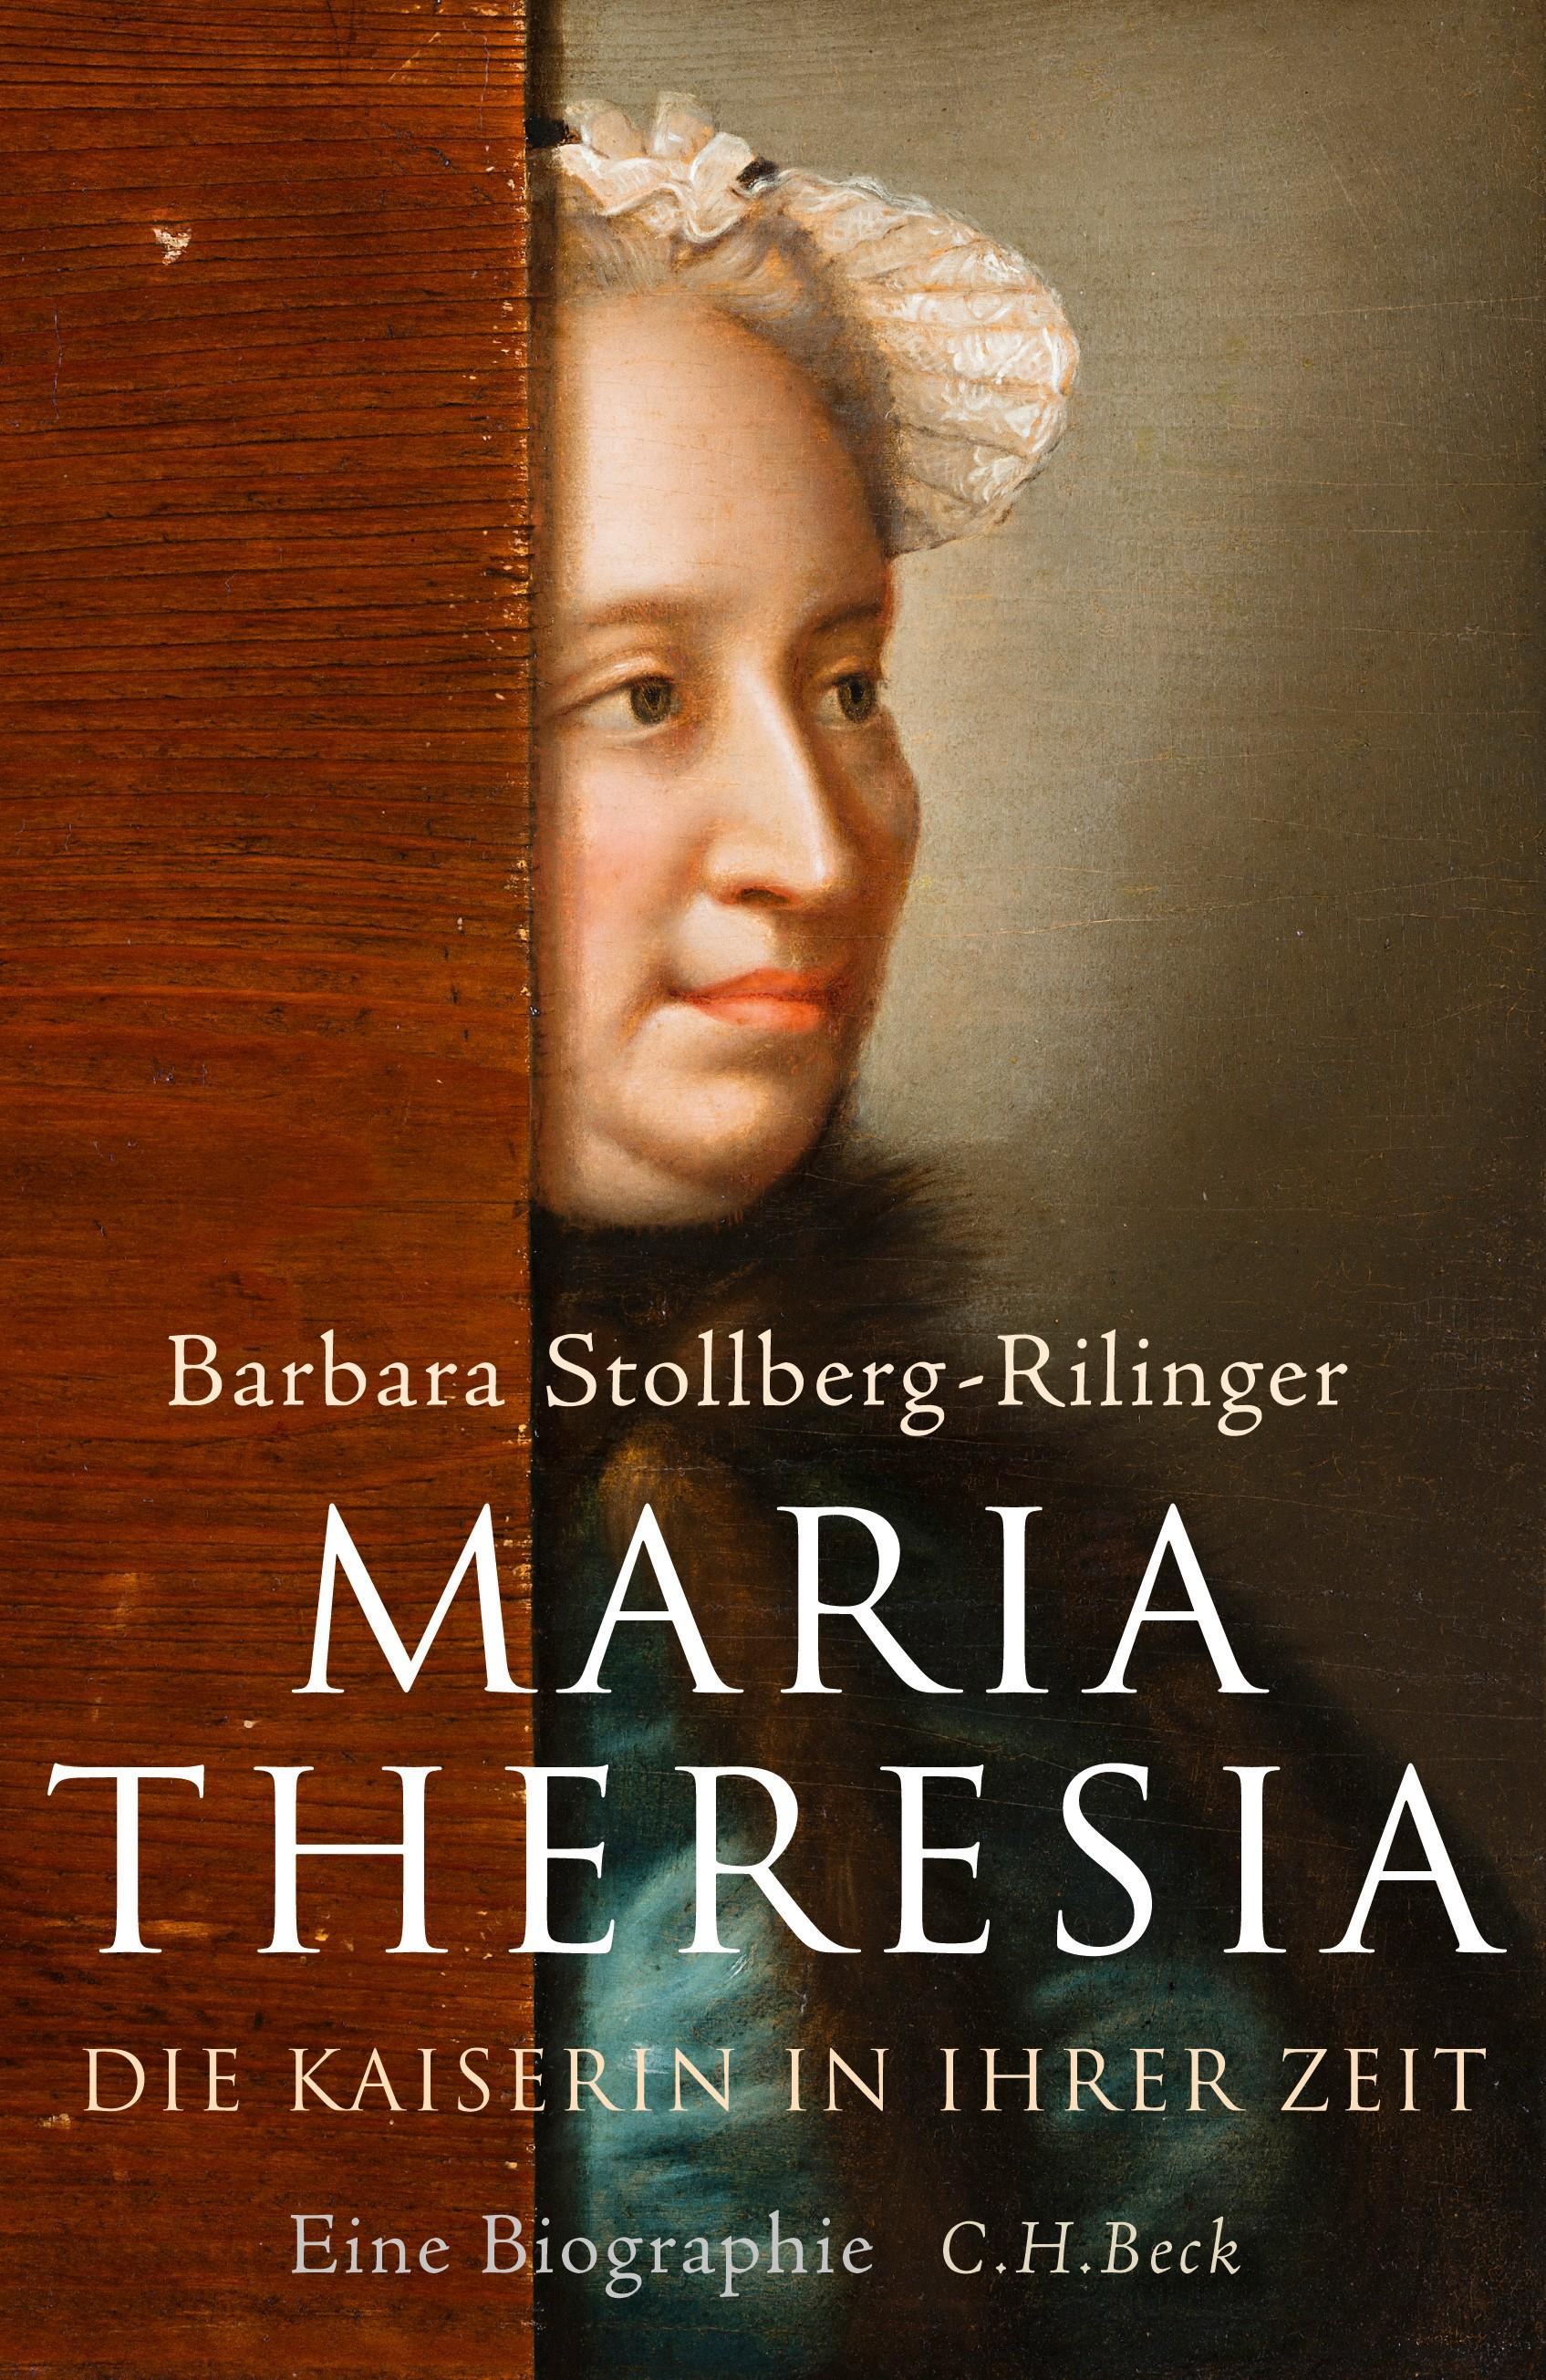 Maria Theresia | Stollberg-Rilinger, Barbara | 5., durchgesehene Auflage, 2018 | Buch (Cover)